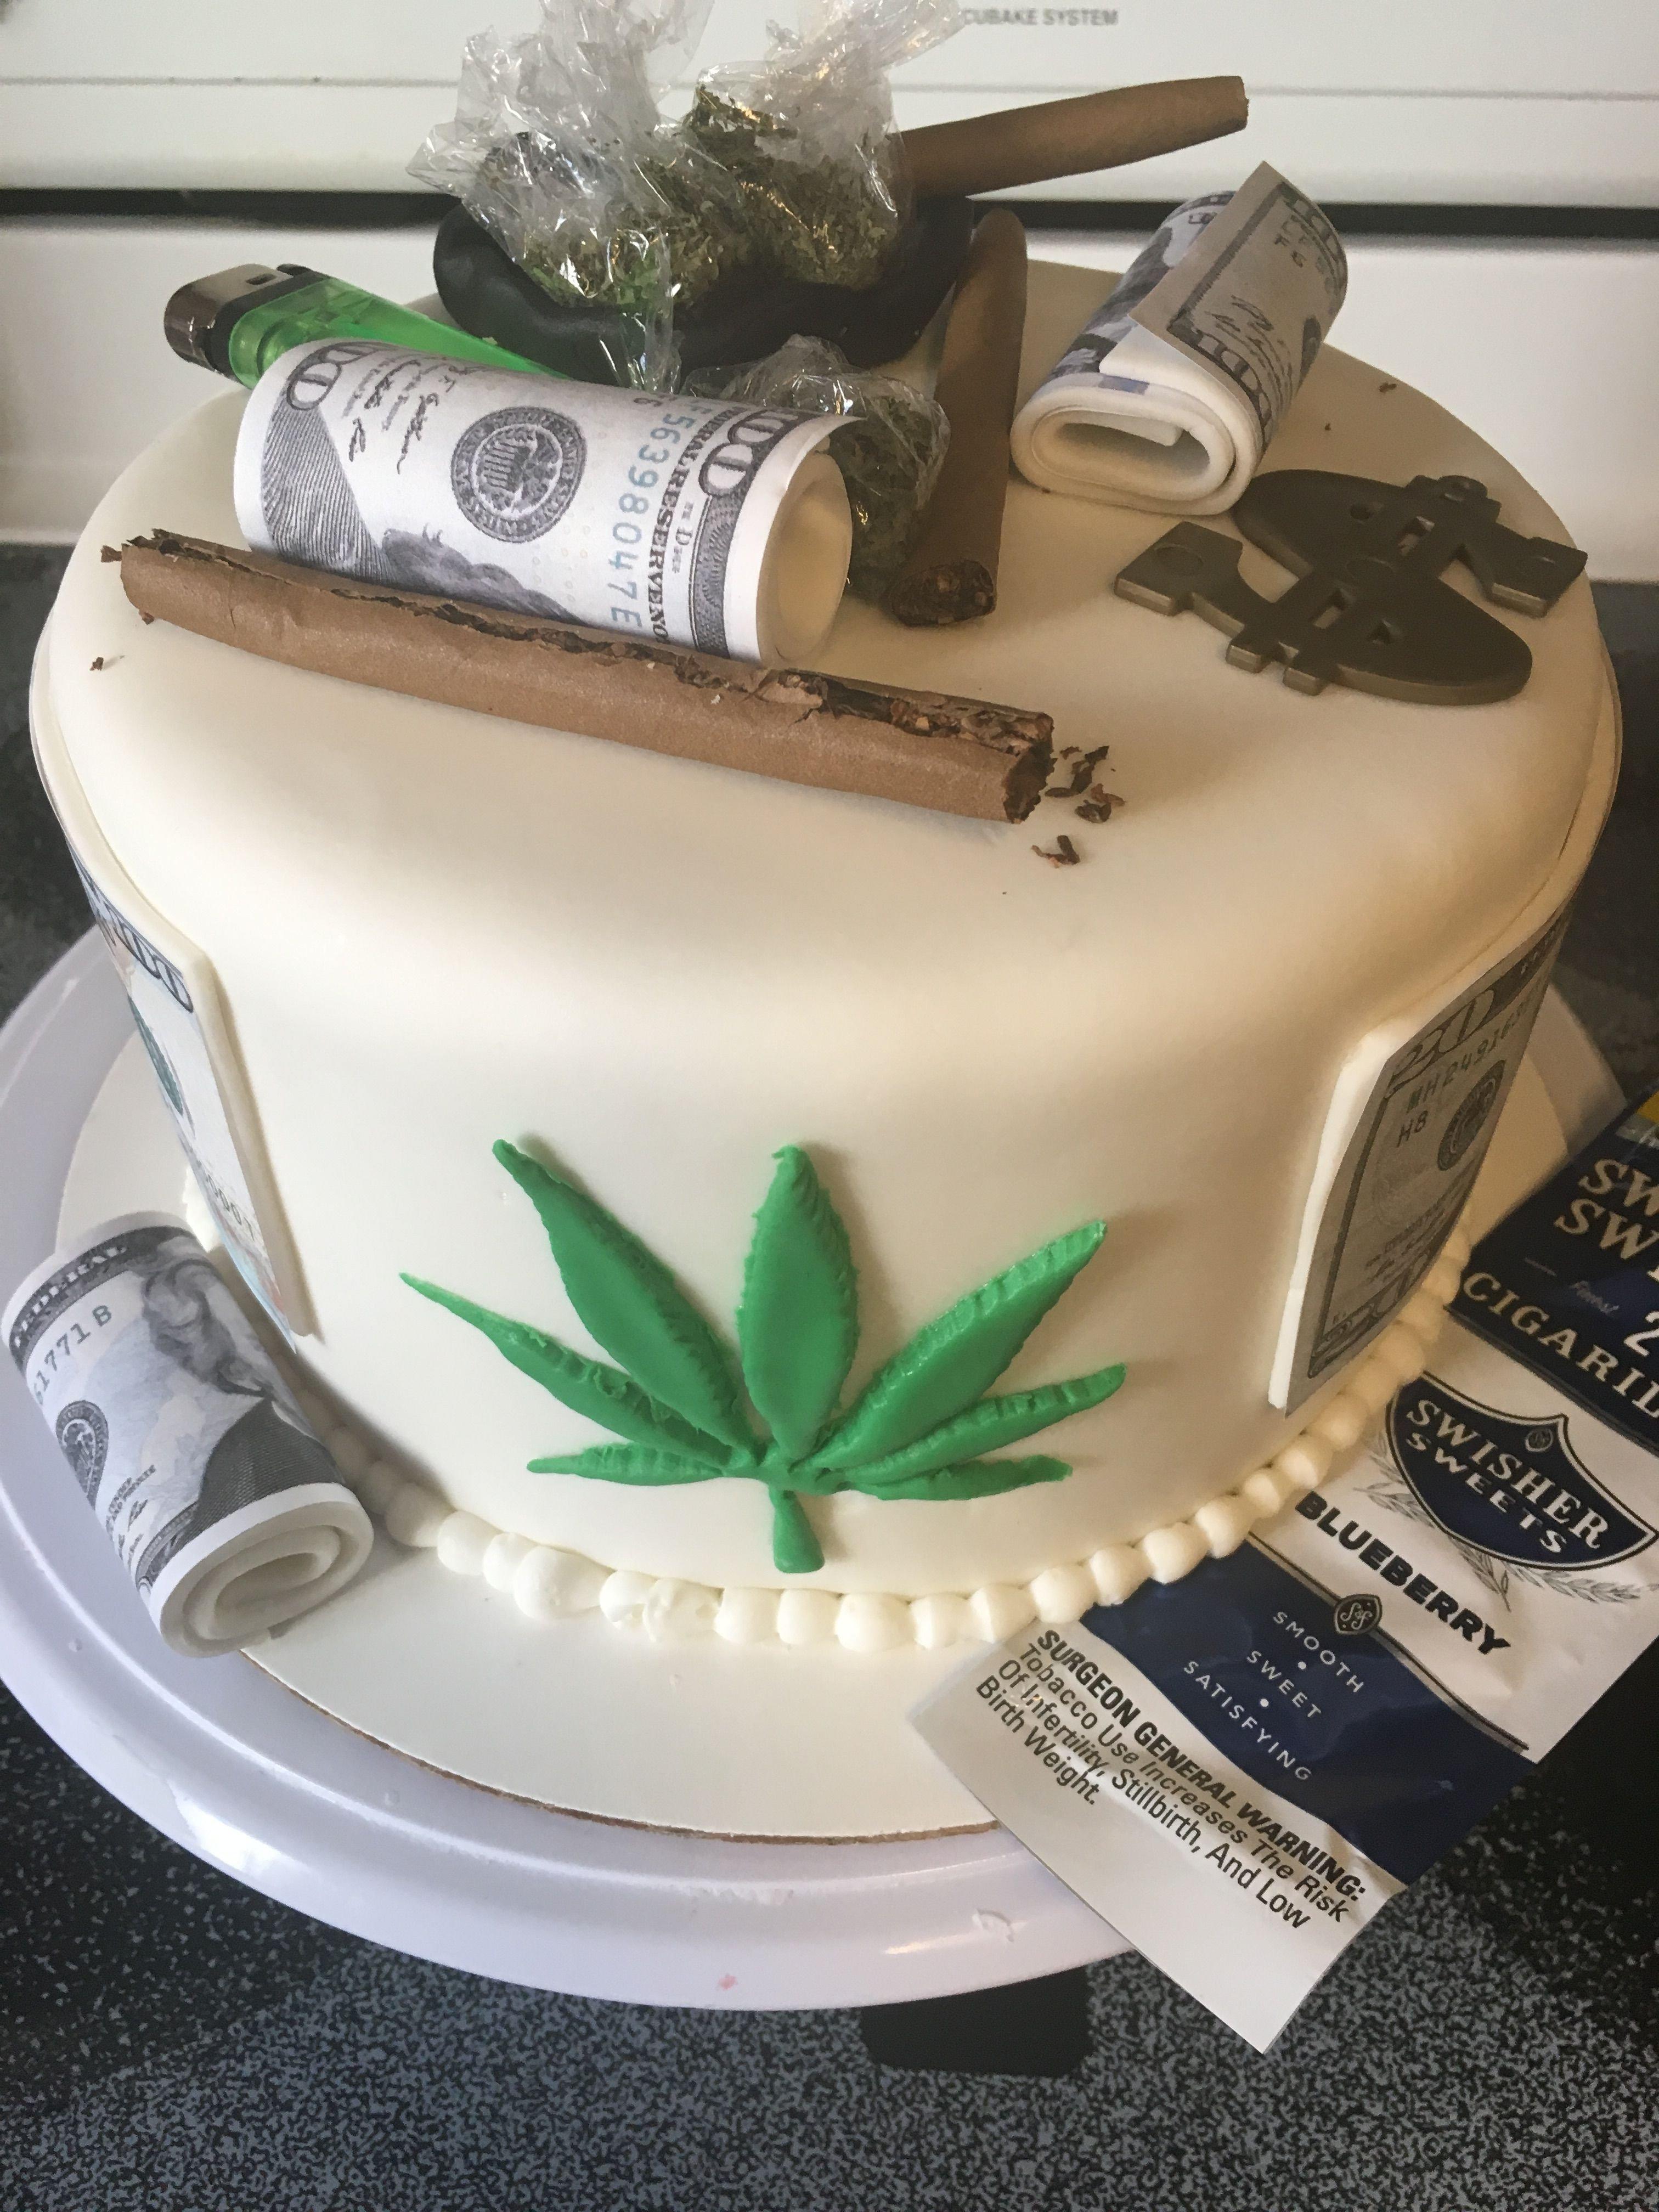 10 Fantastic Birthday Cake Ideas For Boyfriend weed cake birthday cakes pinterest cake birthdays and cake 2020